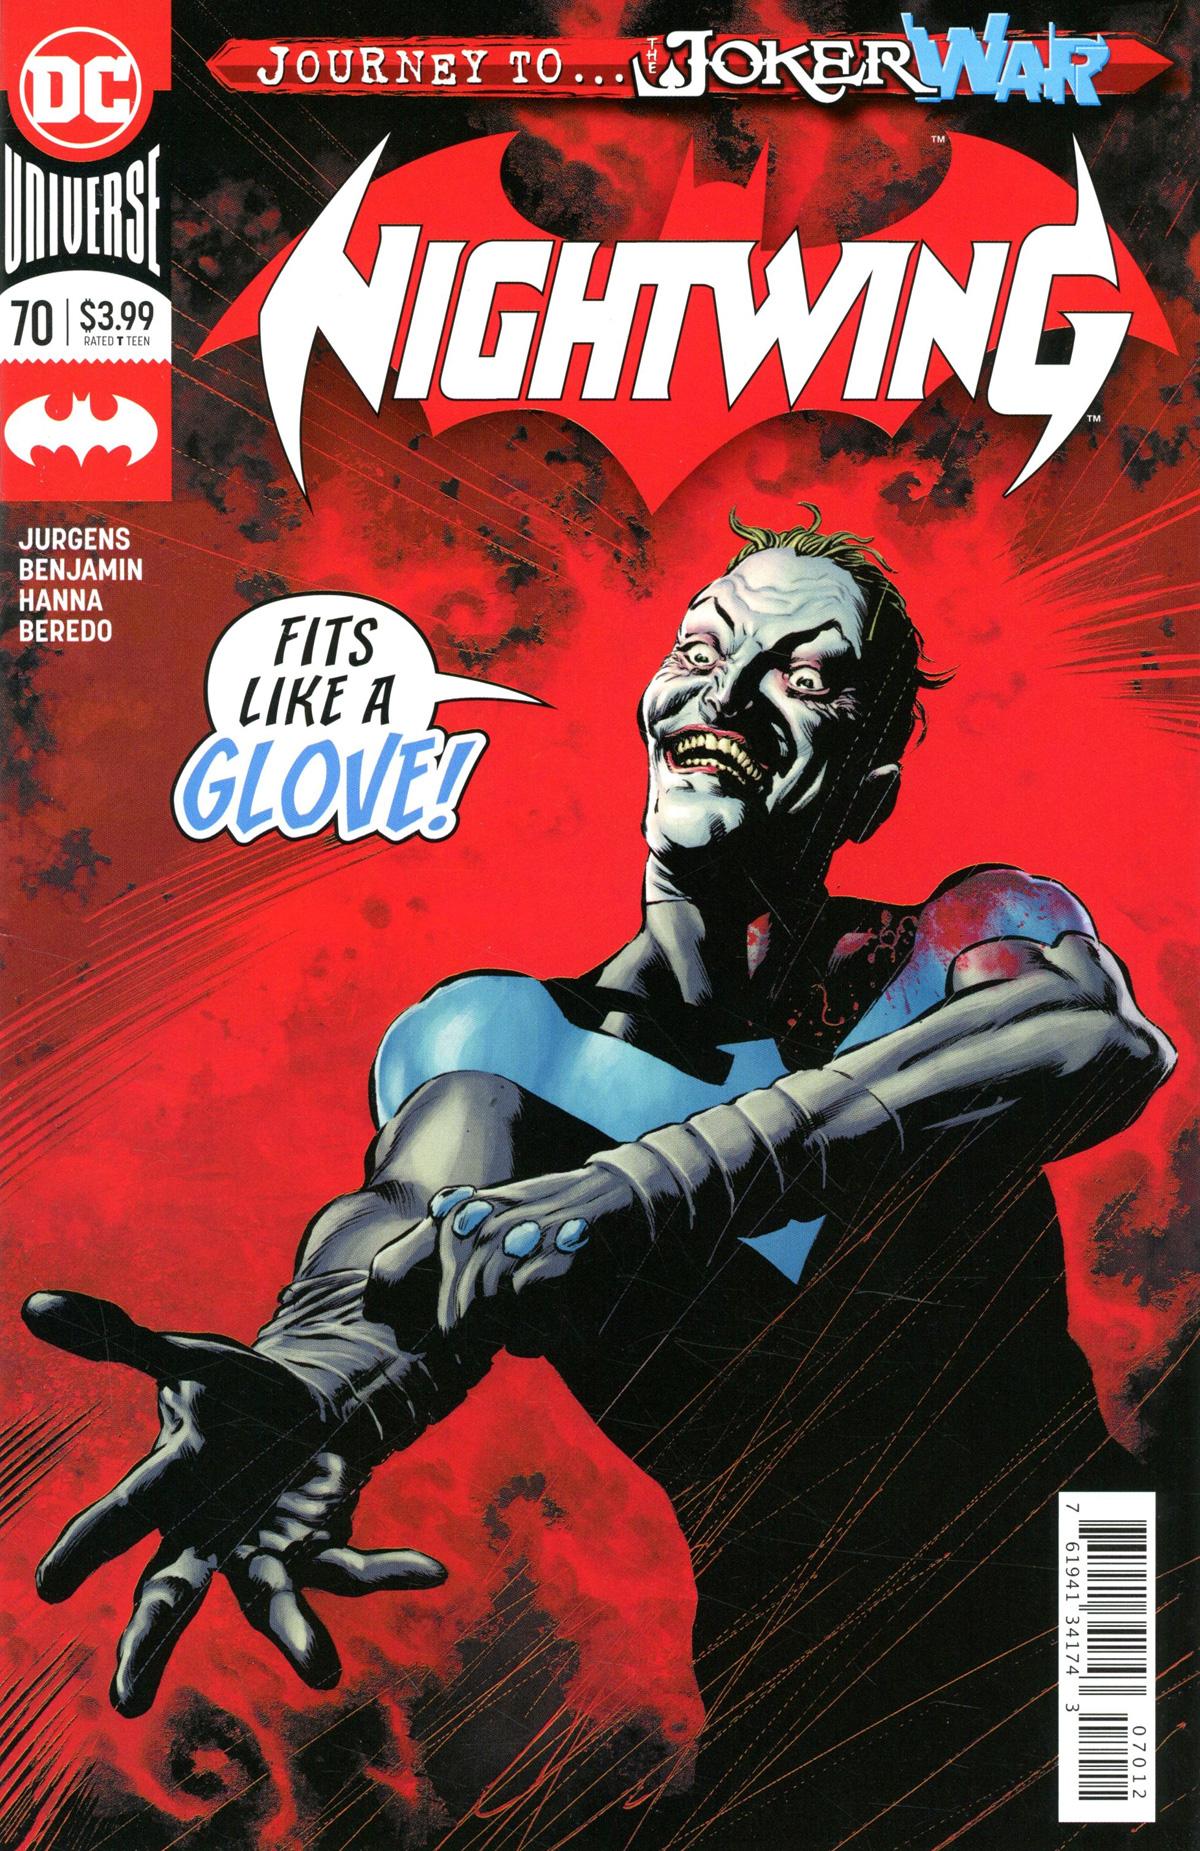 Nightwing Vol 4 #70 Cover C 2nd Ptg (Joker War Tie-In)